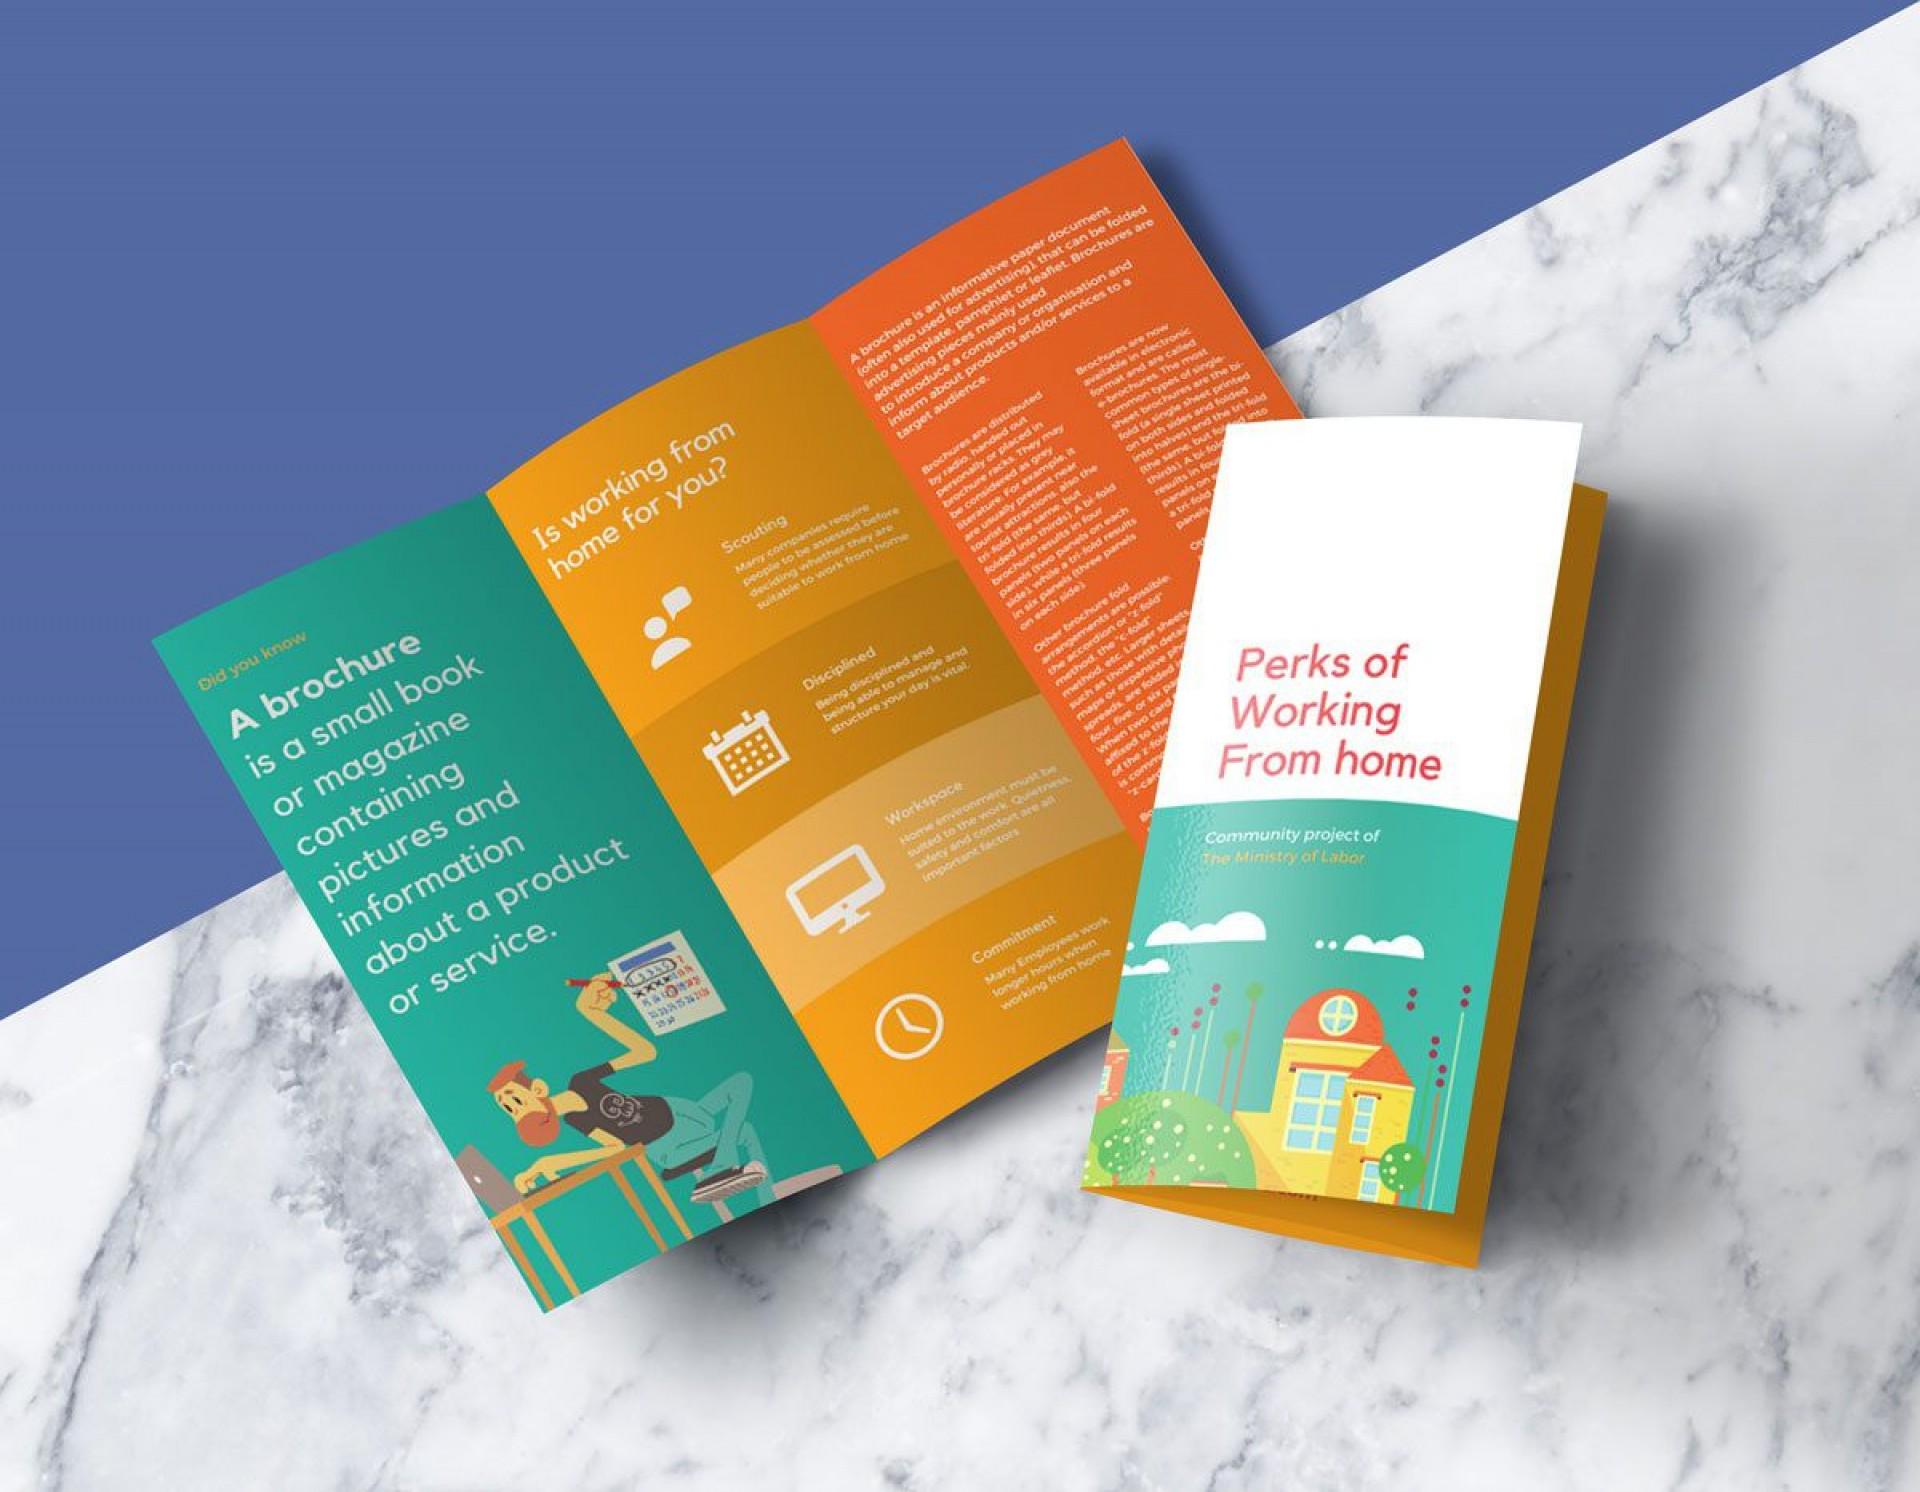 004 Sensational Free Tri Fold Brochure Template High Def  Photoshop Illustrator Microsoft Word 20101920